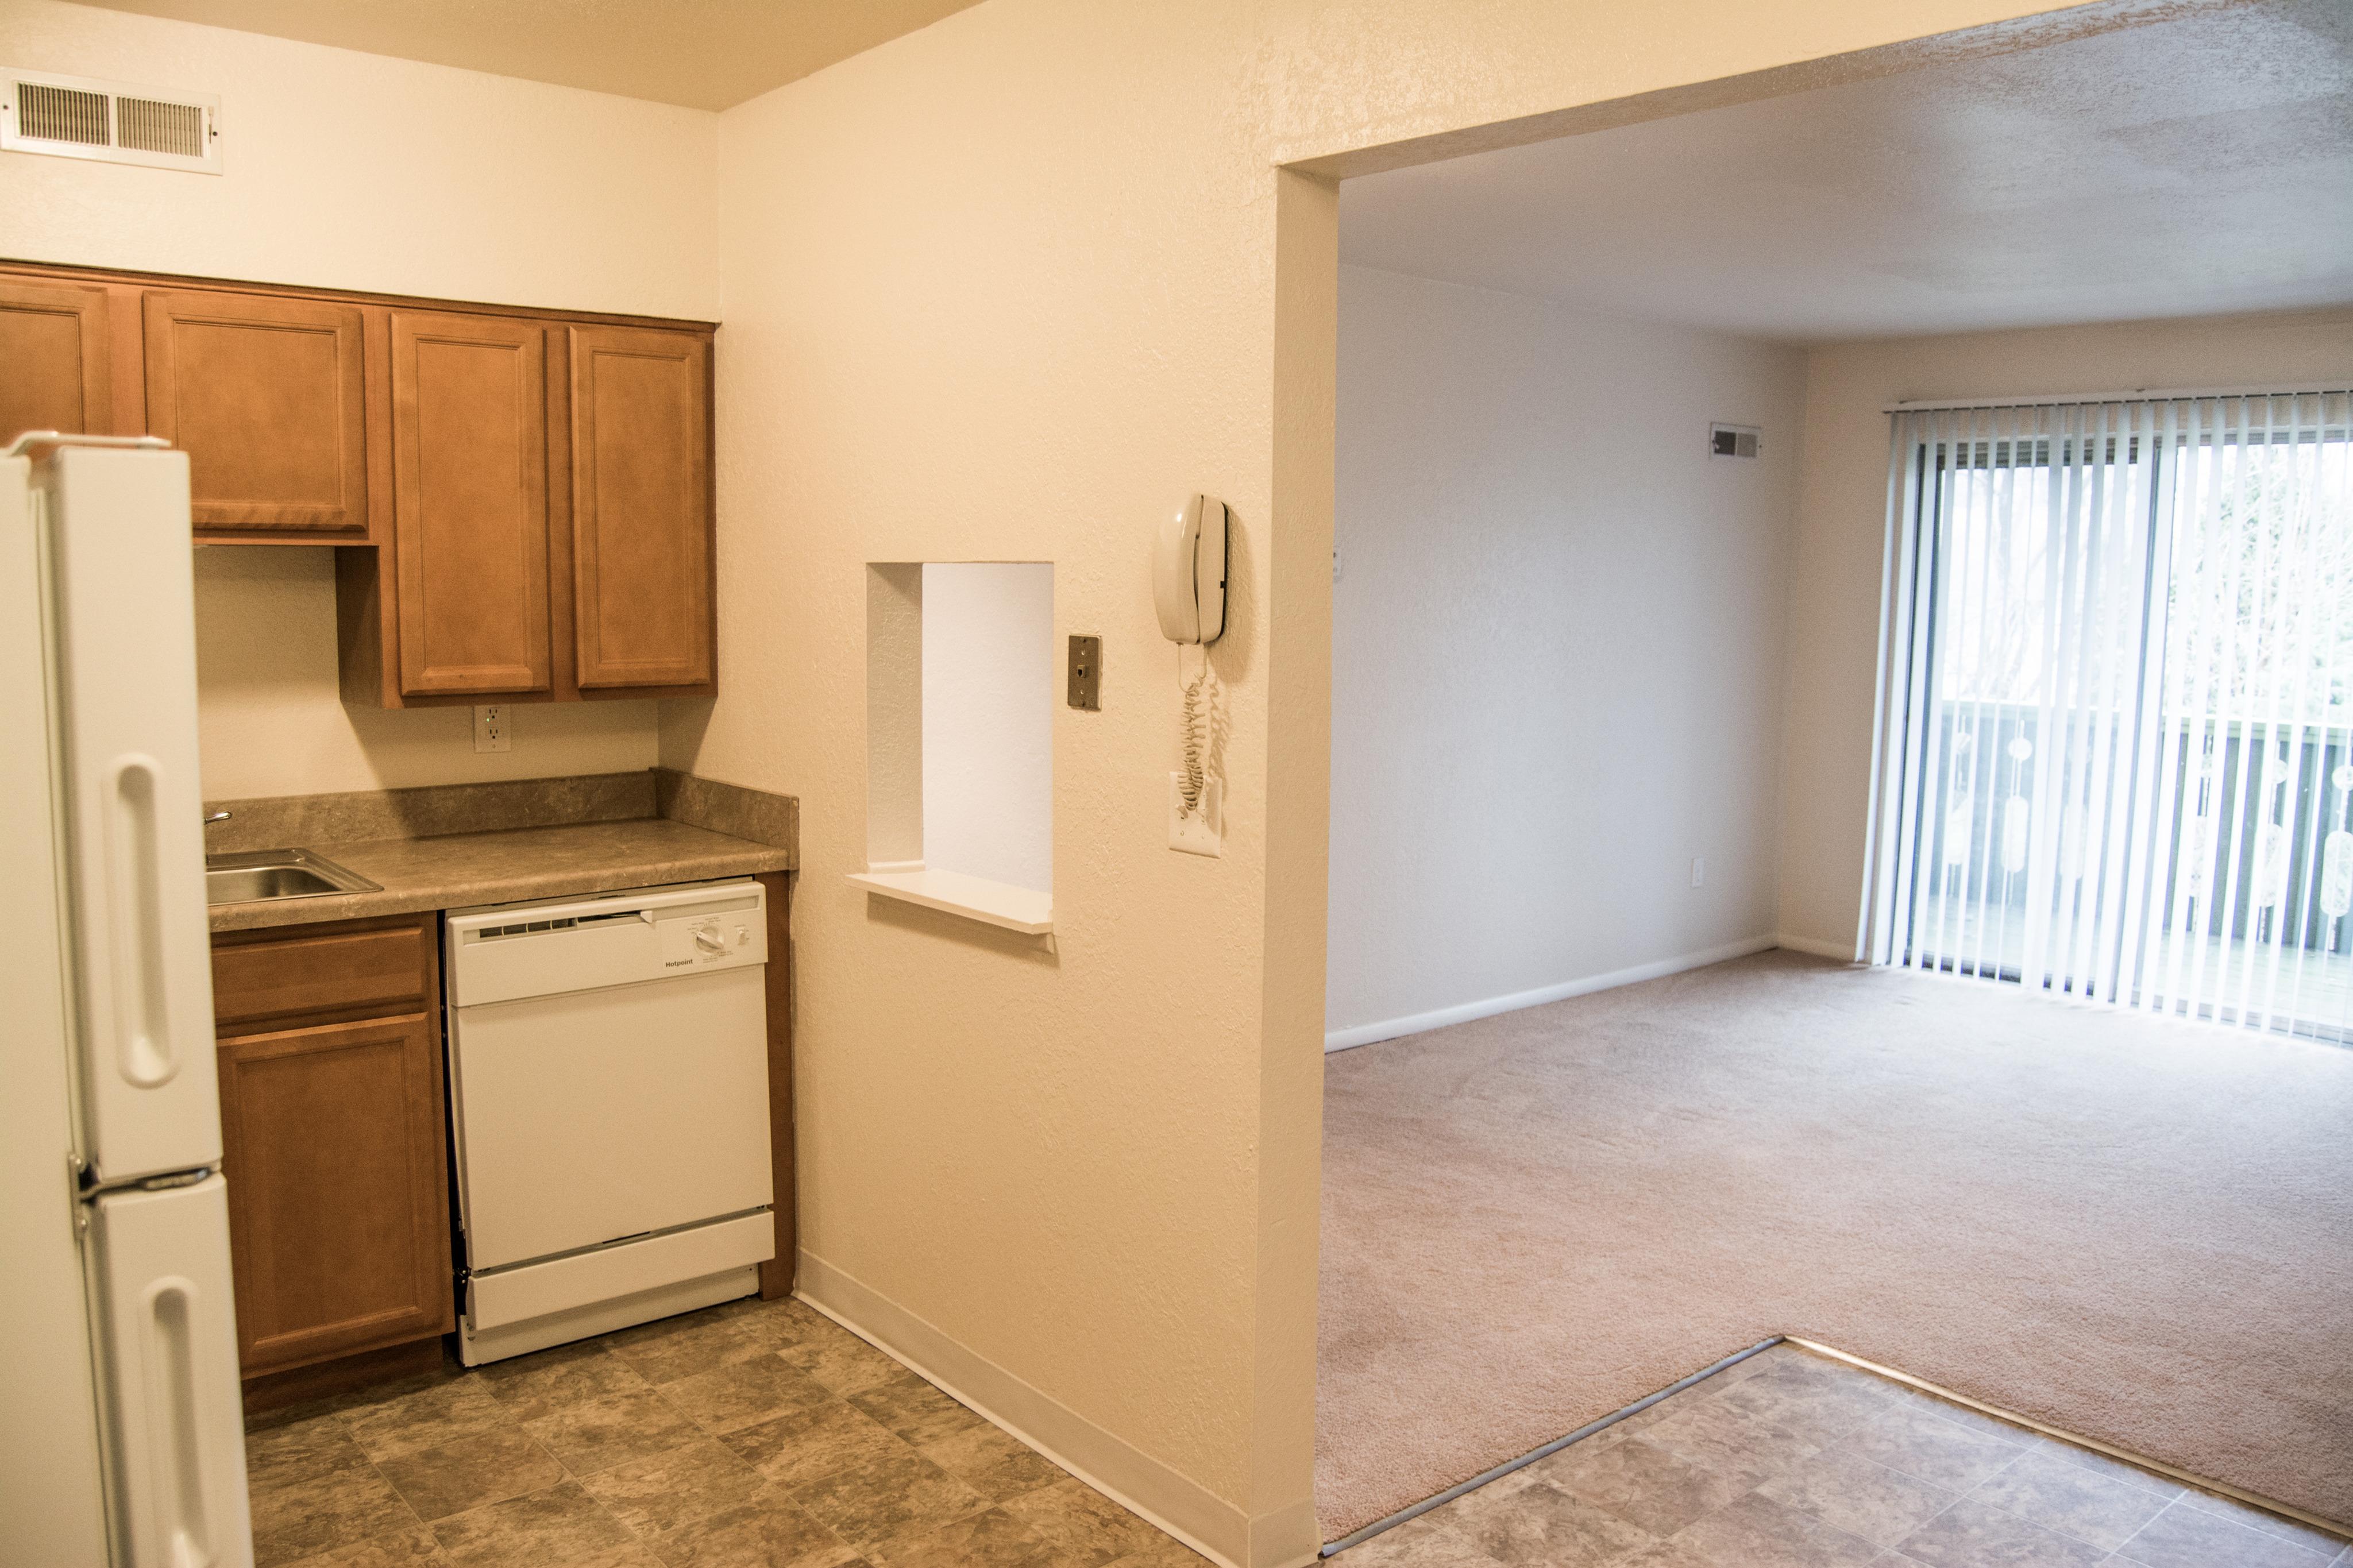 Briargate Apartments Portage MI